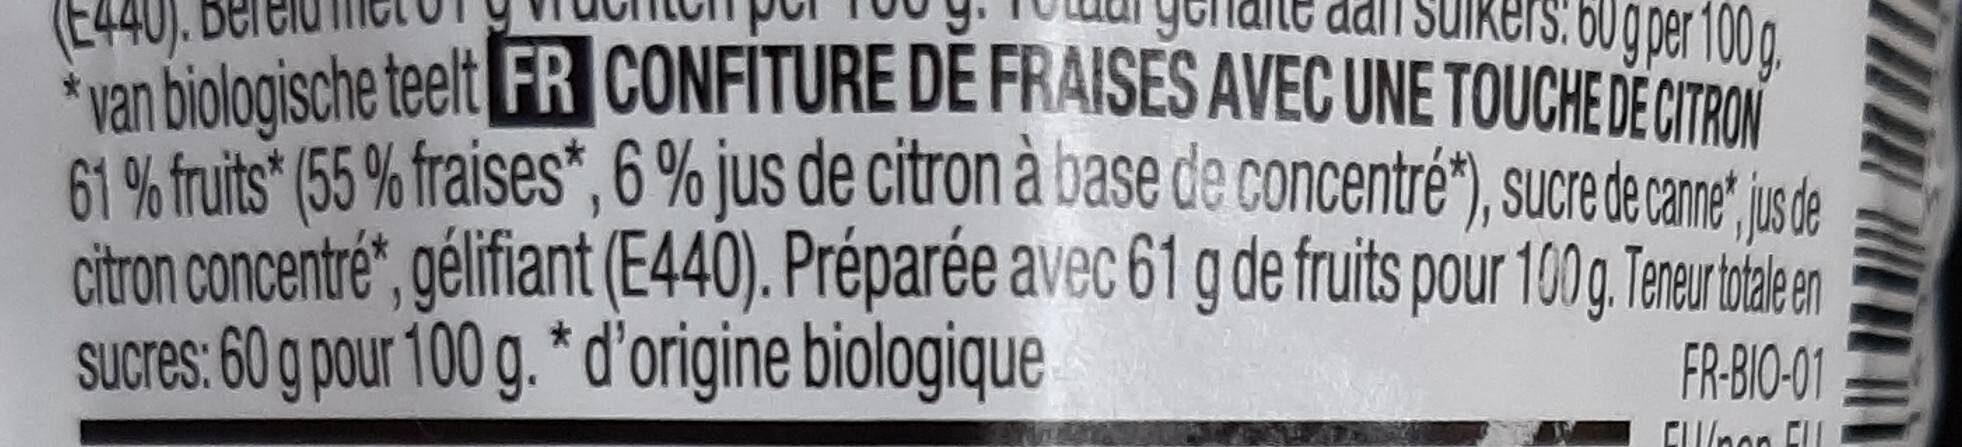 Confiture Bio Fraises - Ingrediënten - fr